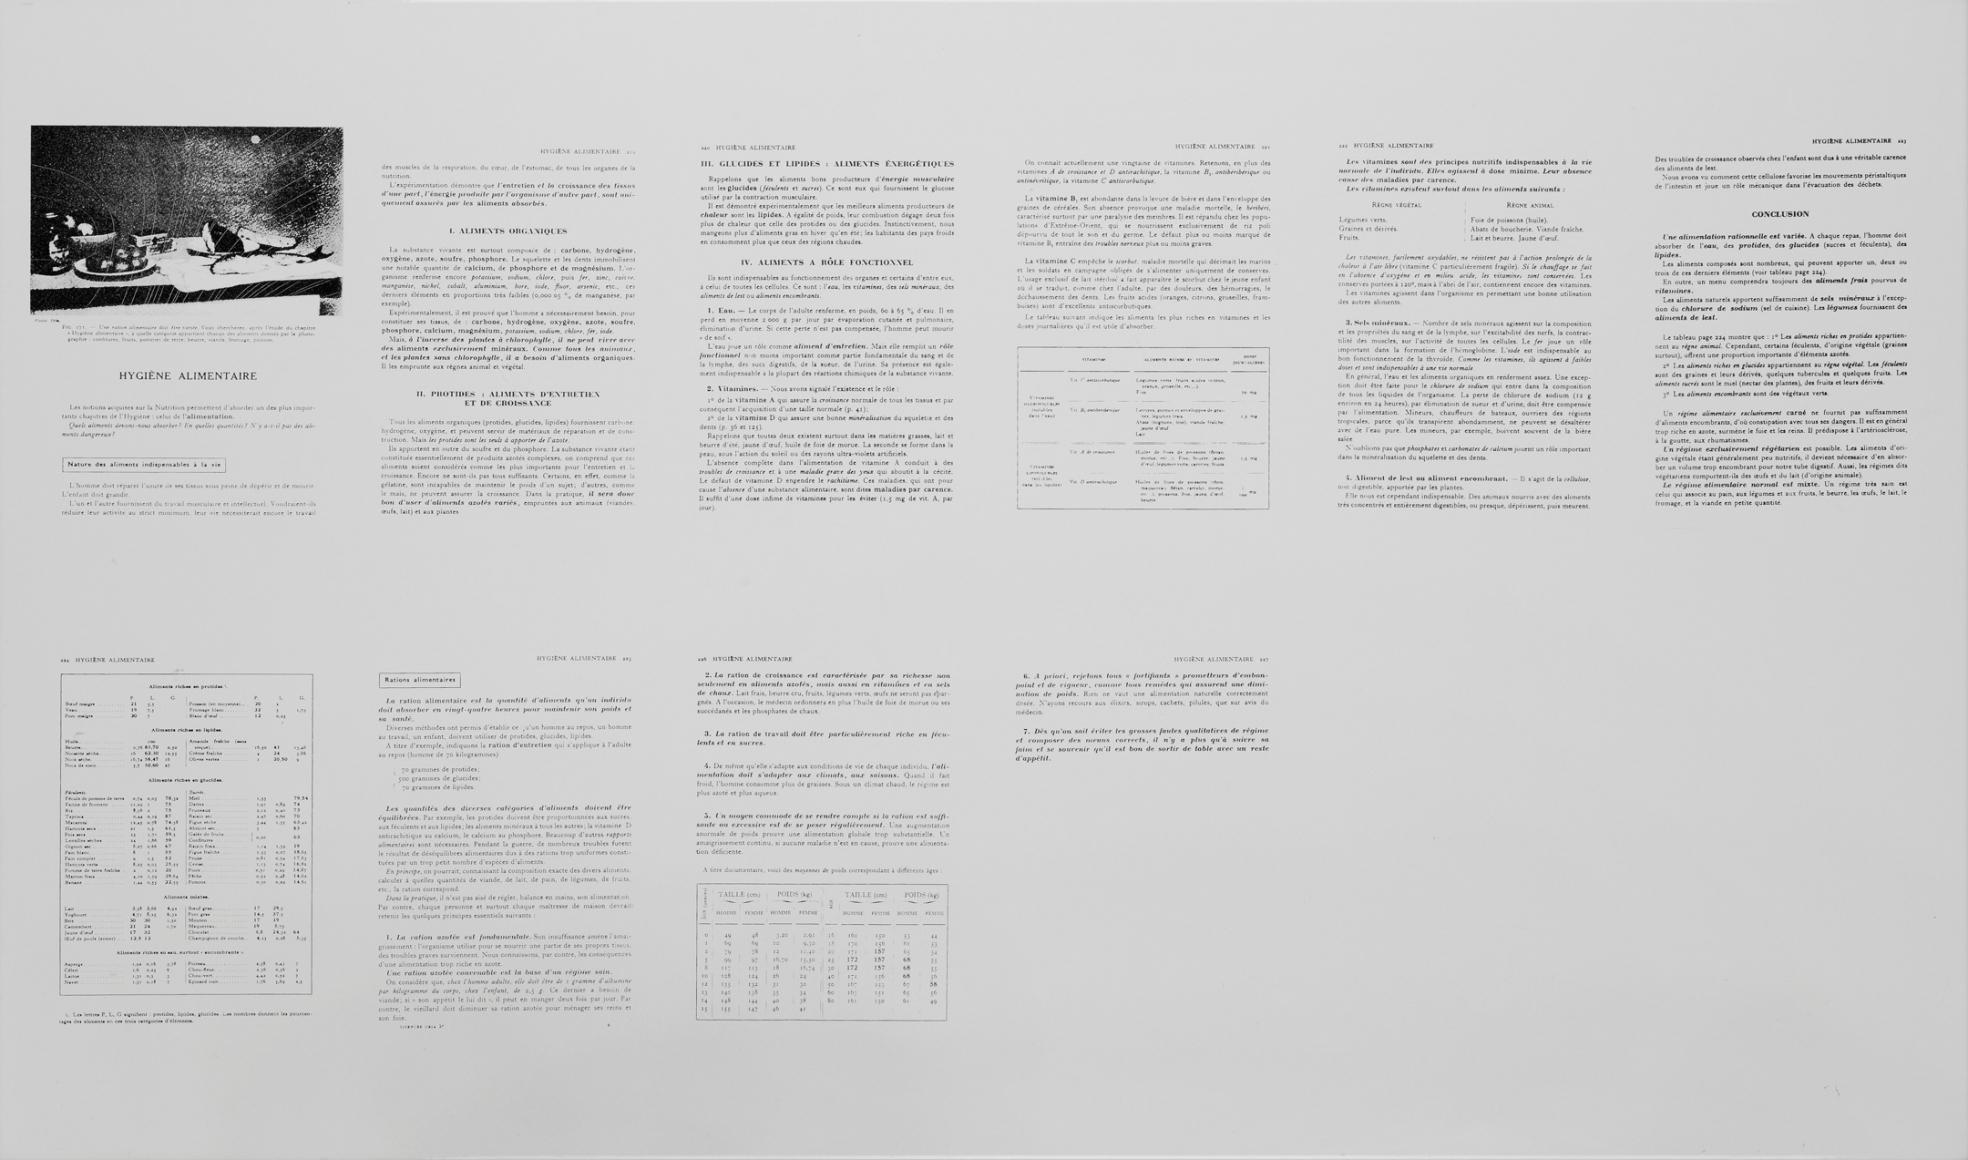 Bernar Venet - Atelier A - Works - Demisch Danant